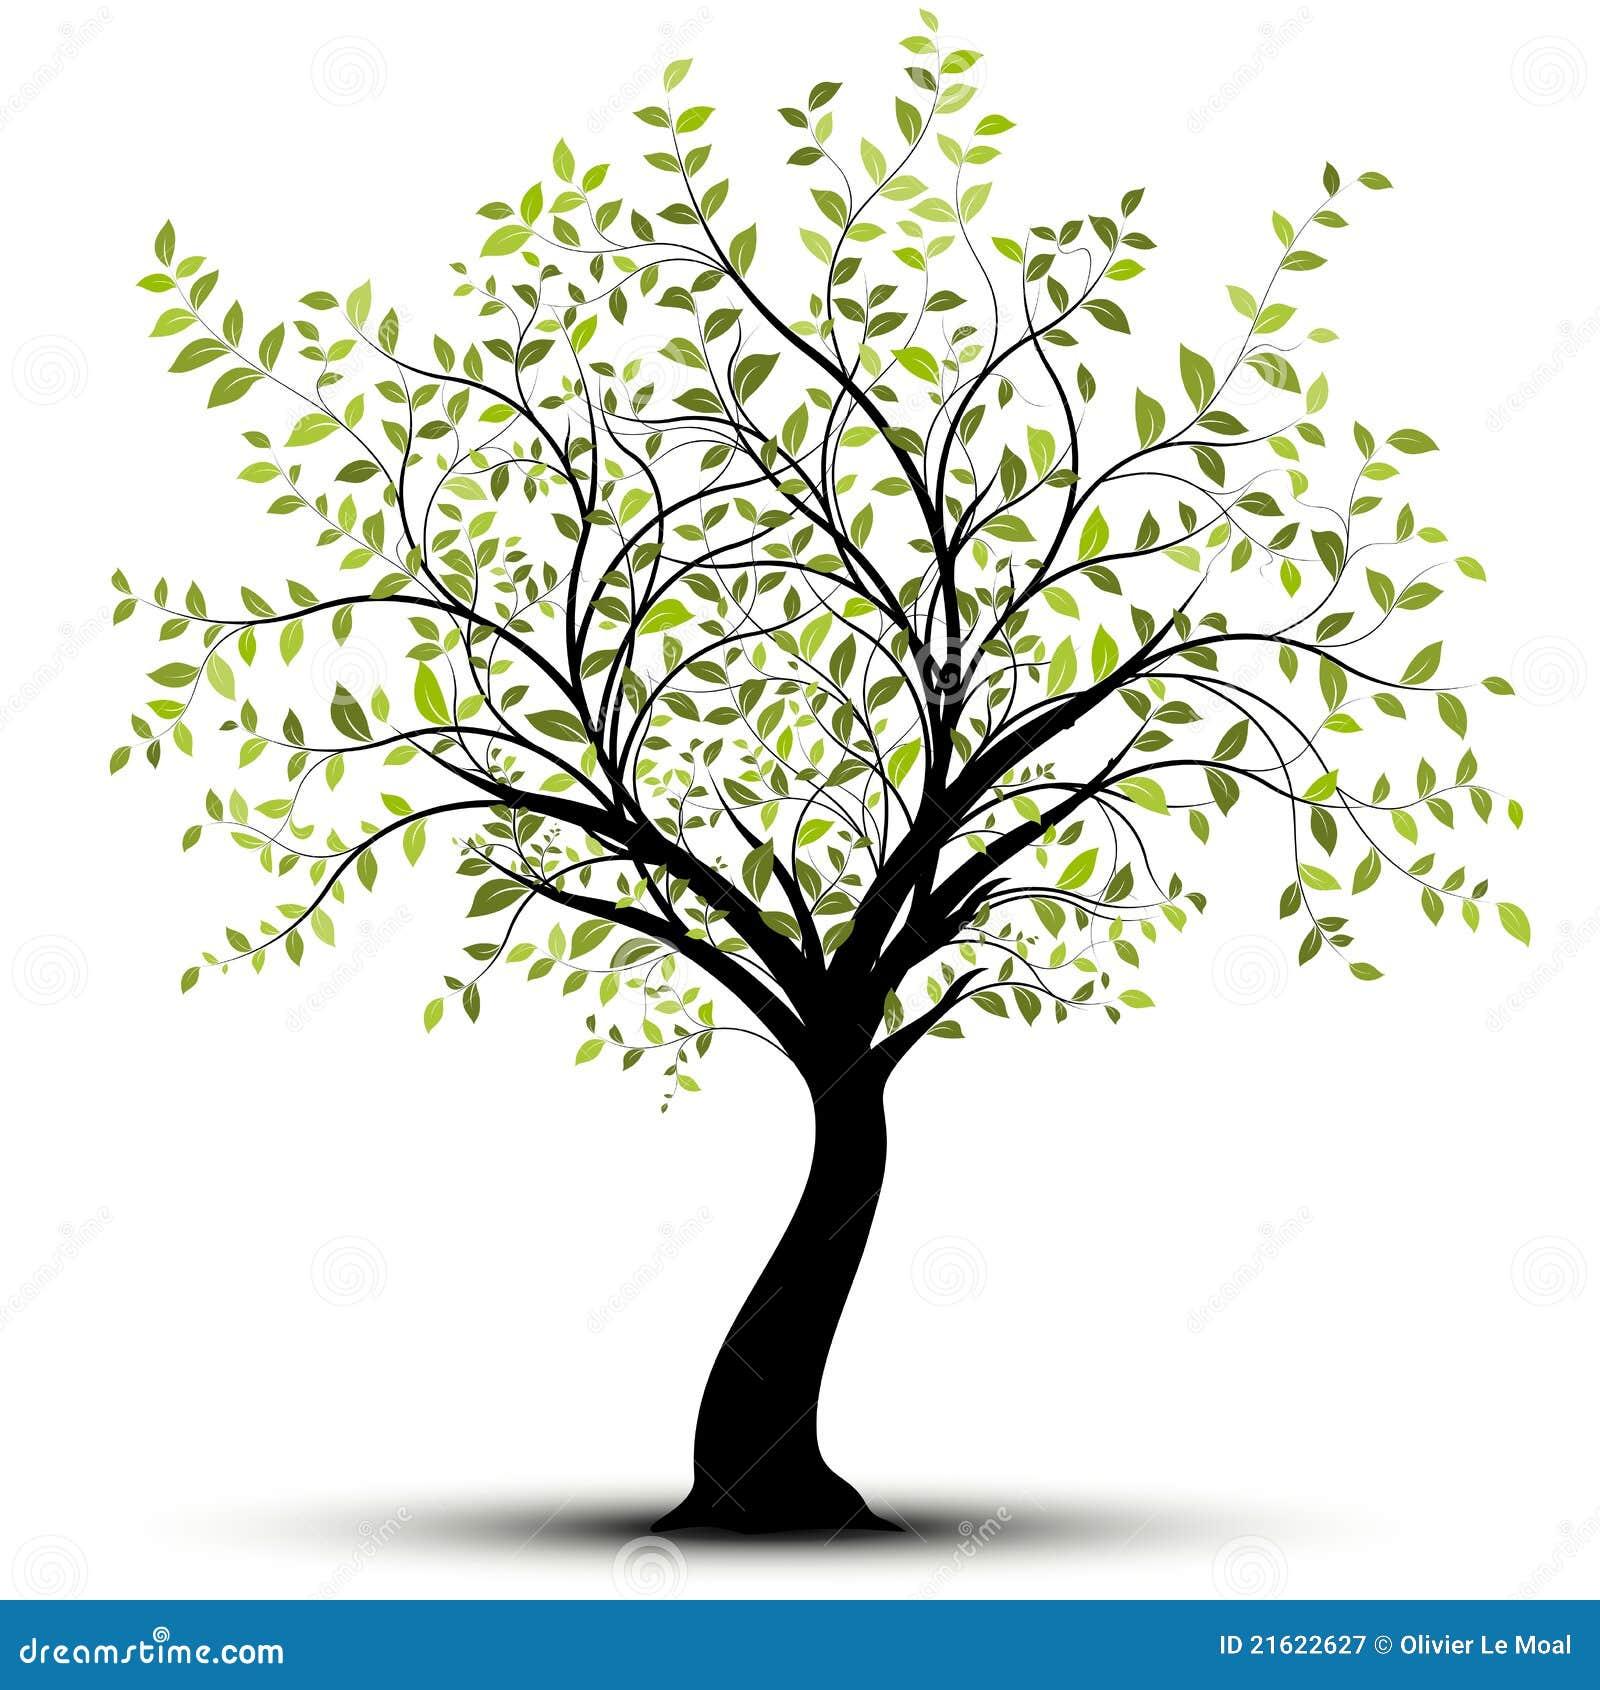 1ª RONDA MASTERS SPAINGFX 5º ANIVERSARIO Green-vector-tree-white-background-21622627